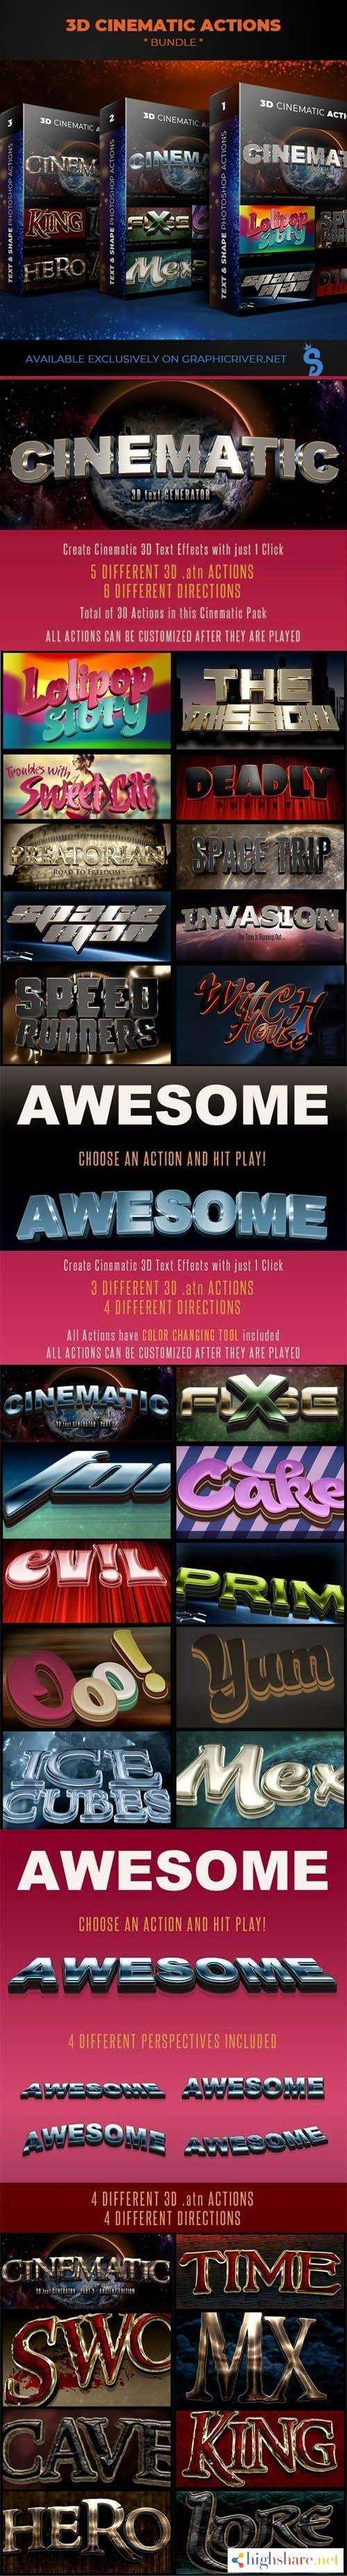 graphicriver 3d cinematic actions bundle 3 packages 5f4a0e800da19 - GraphicRiver - 3D Cinematic Actions Bundle - 3 Packages